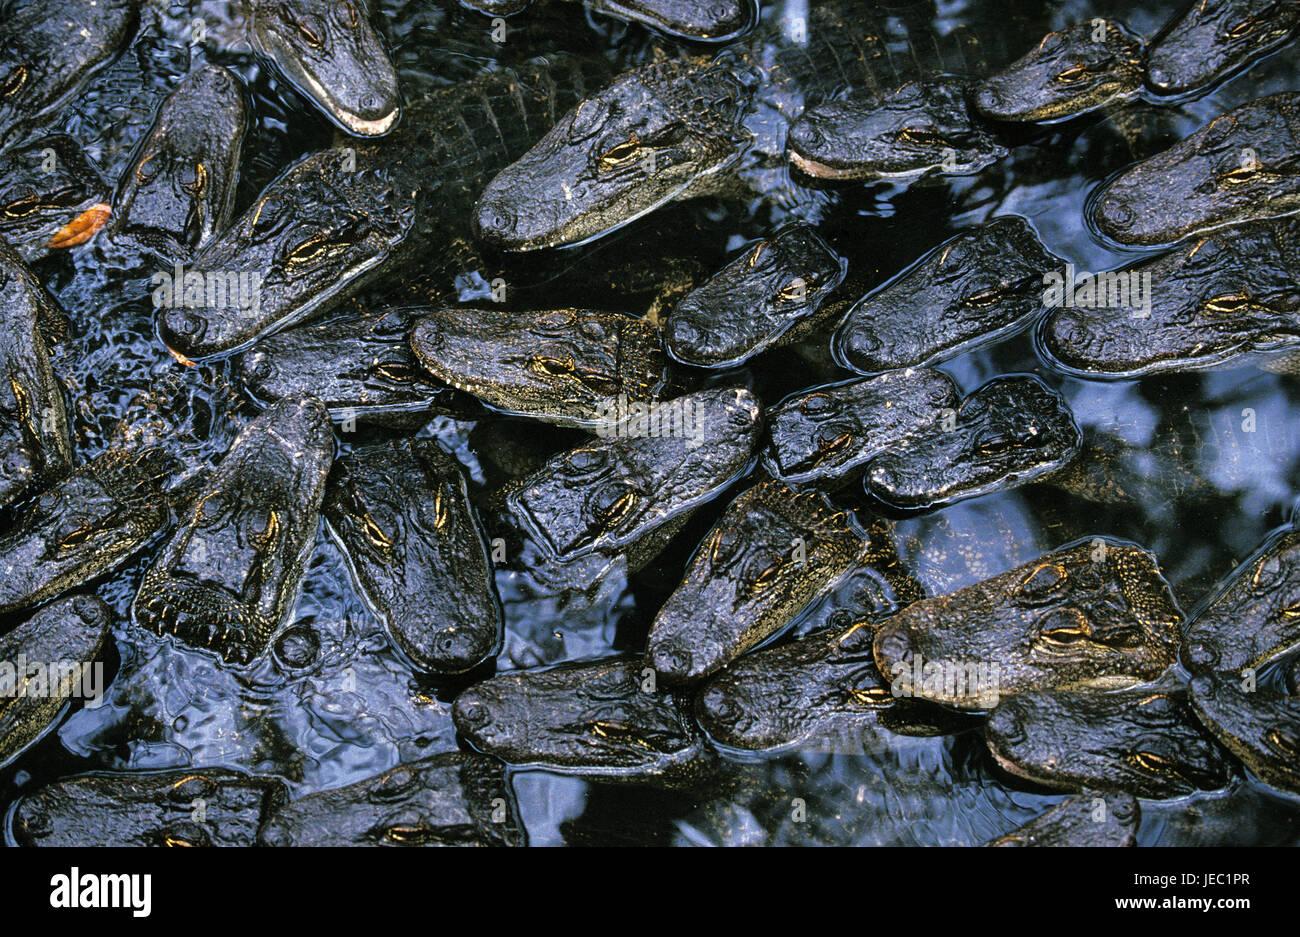 Mississippi alligators, alligator mississipiensis, young animals, crocodile farm, - Stock Image